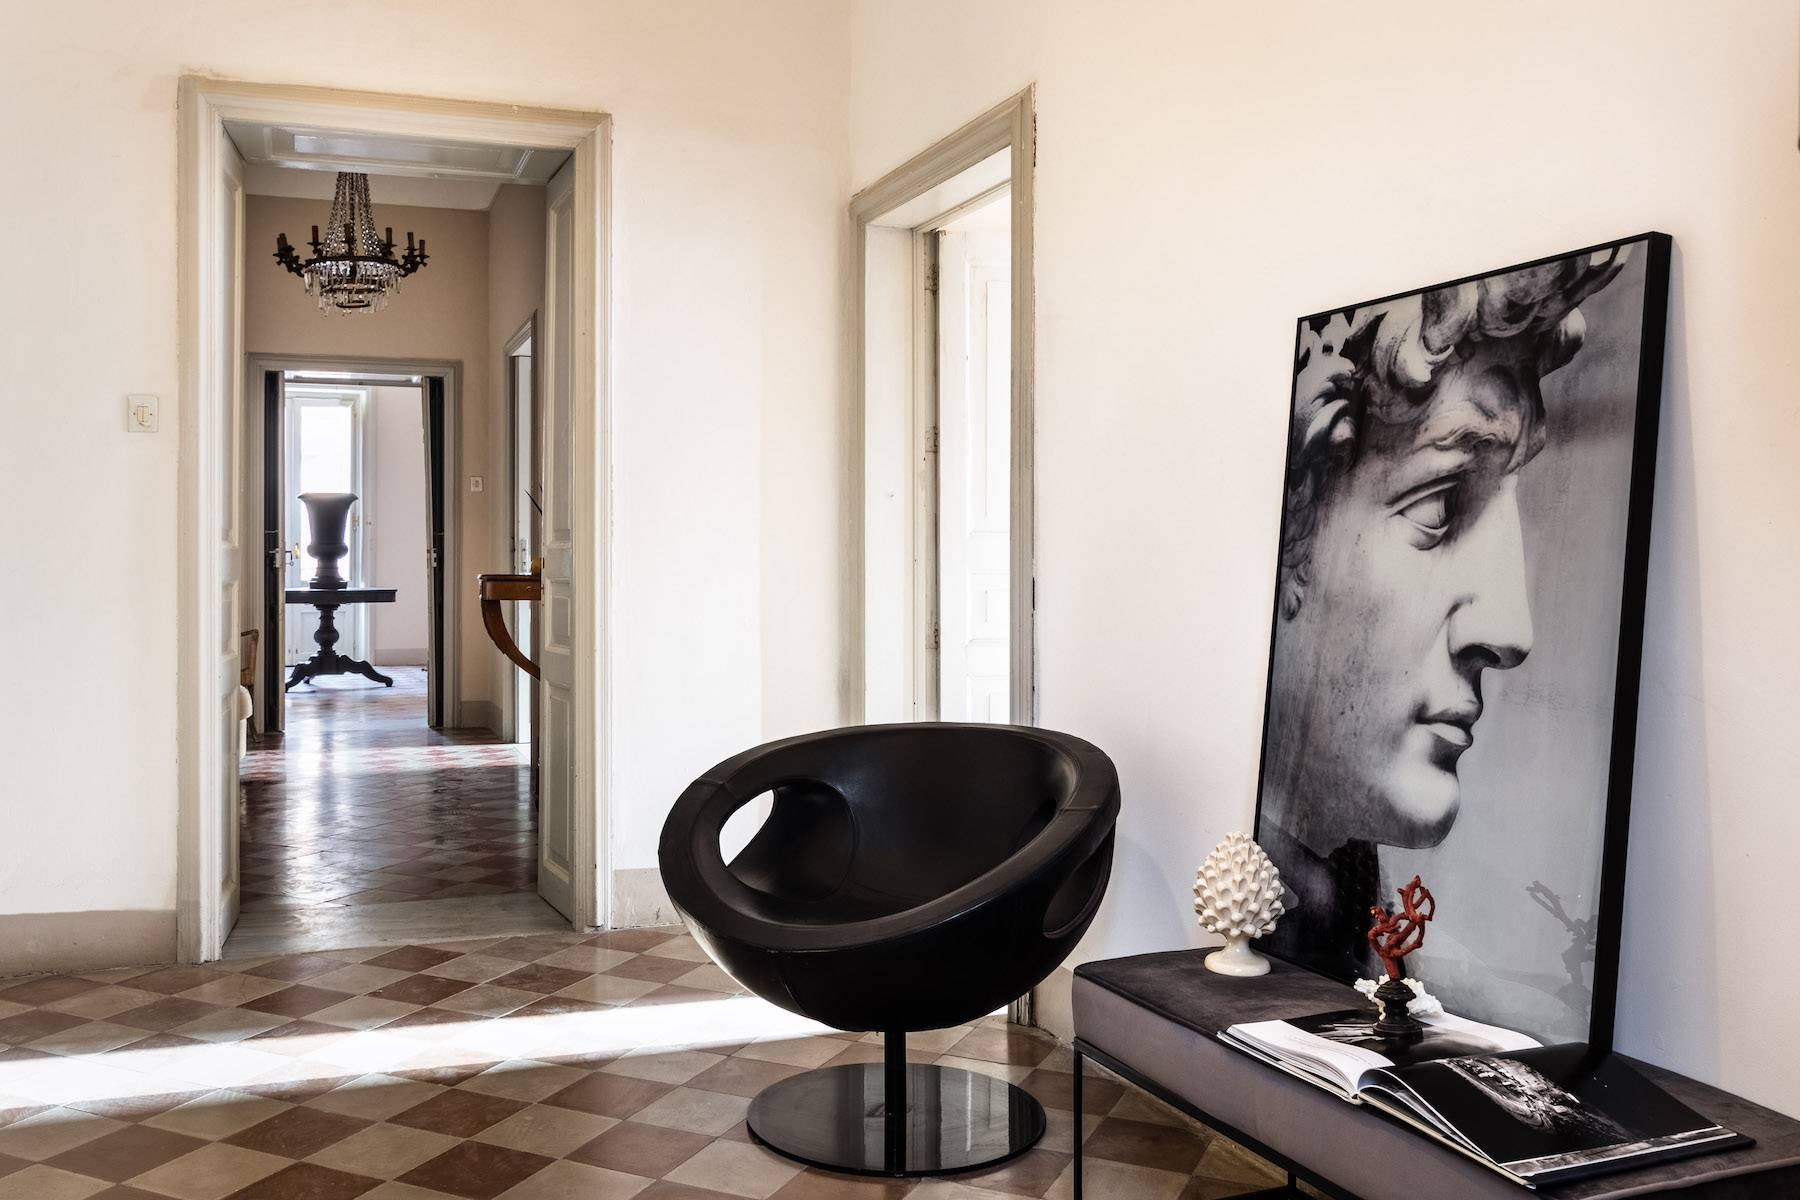 Appartamento in Vendita a Noto via principe umberto -  ronco salice